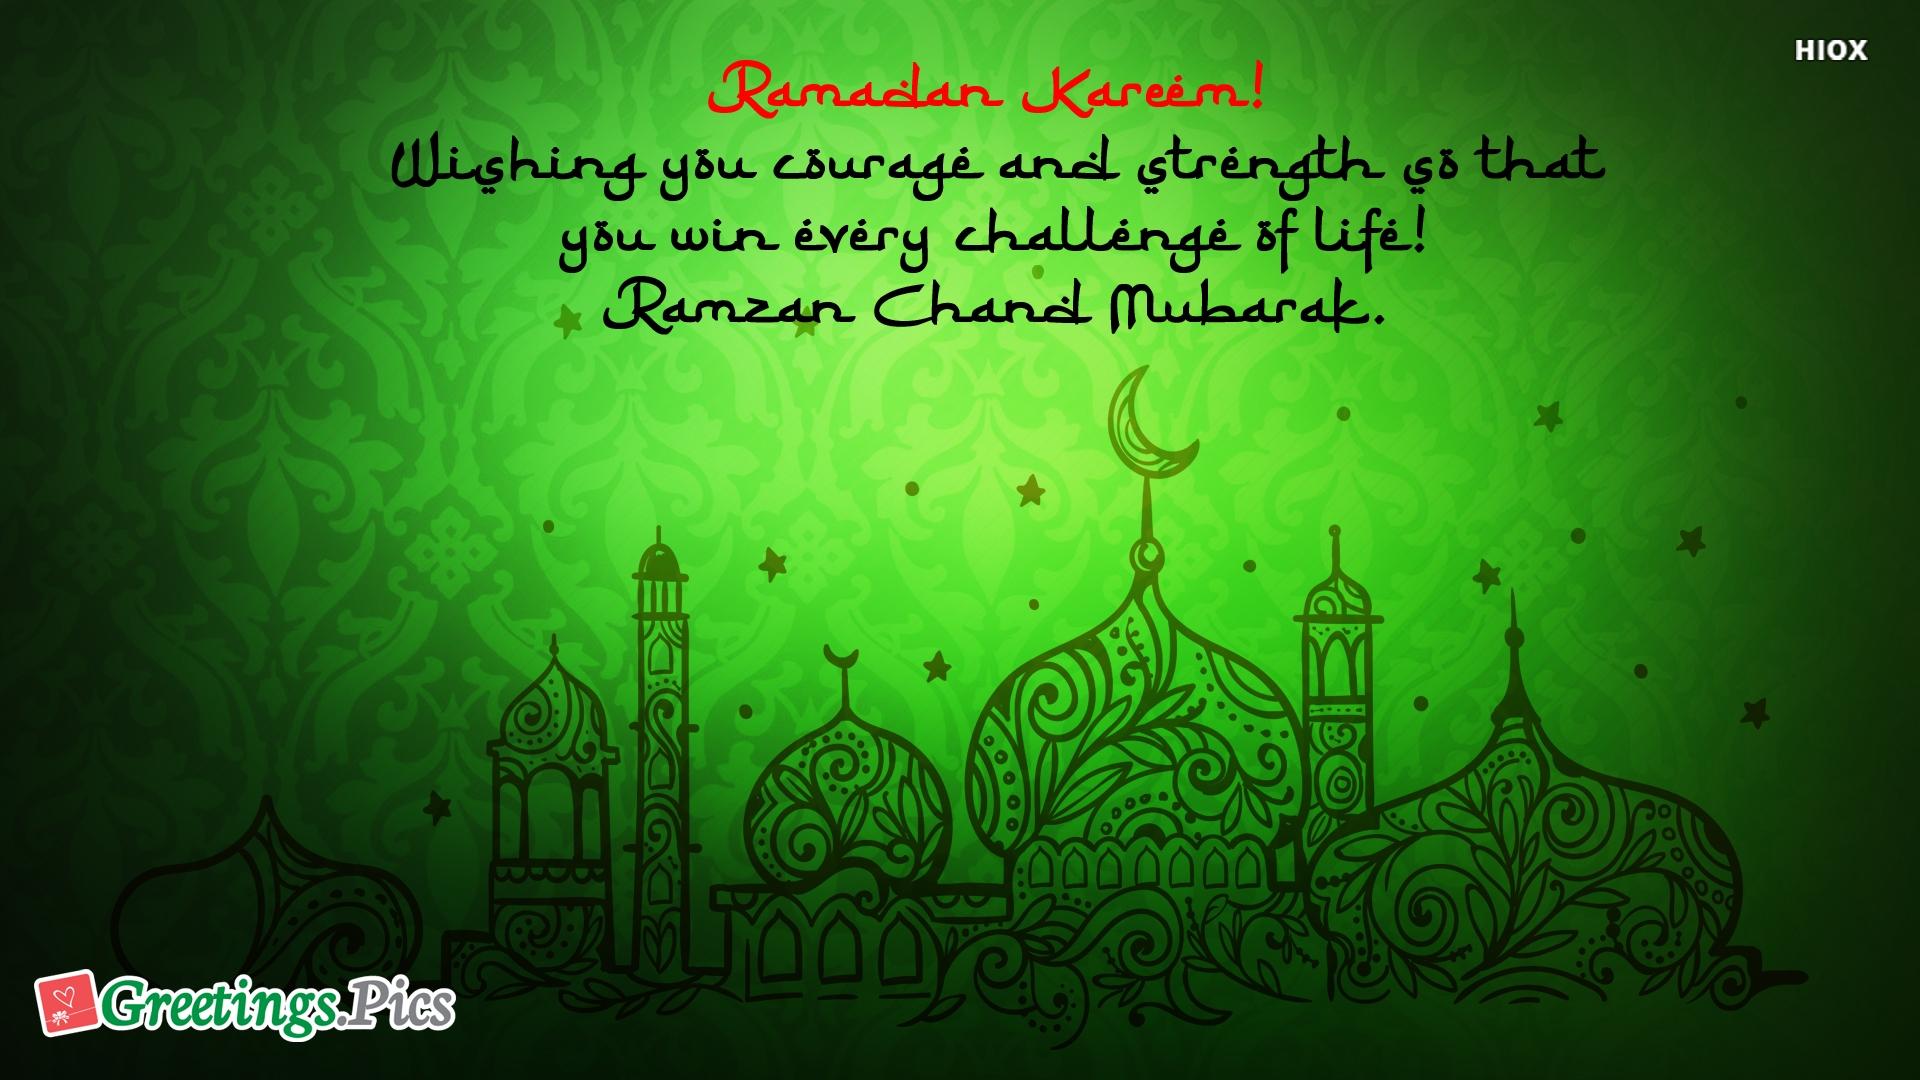 Ramadan Kareem! Wishing You Courage and Strength So That You Win Every Challenge Of Life! Ramzan Chand Mubarak.